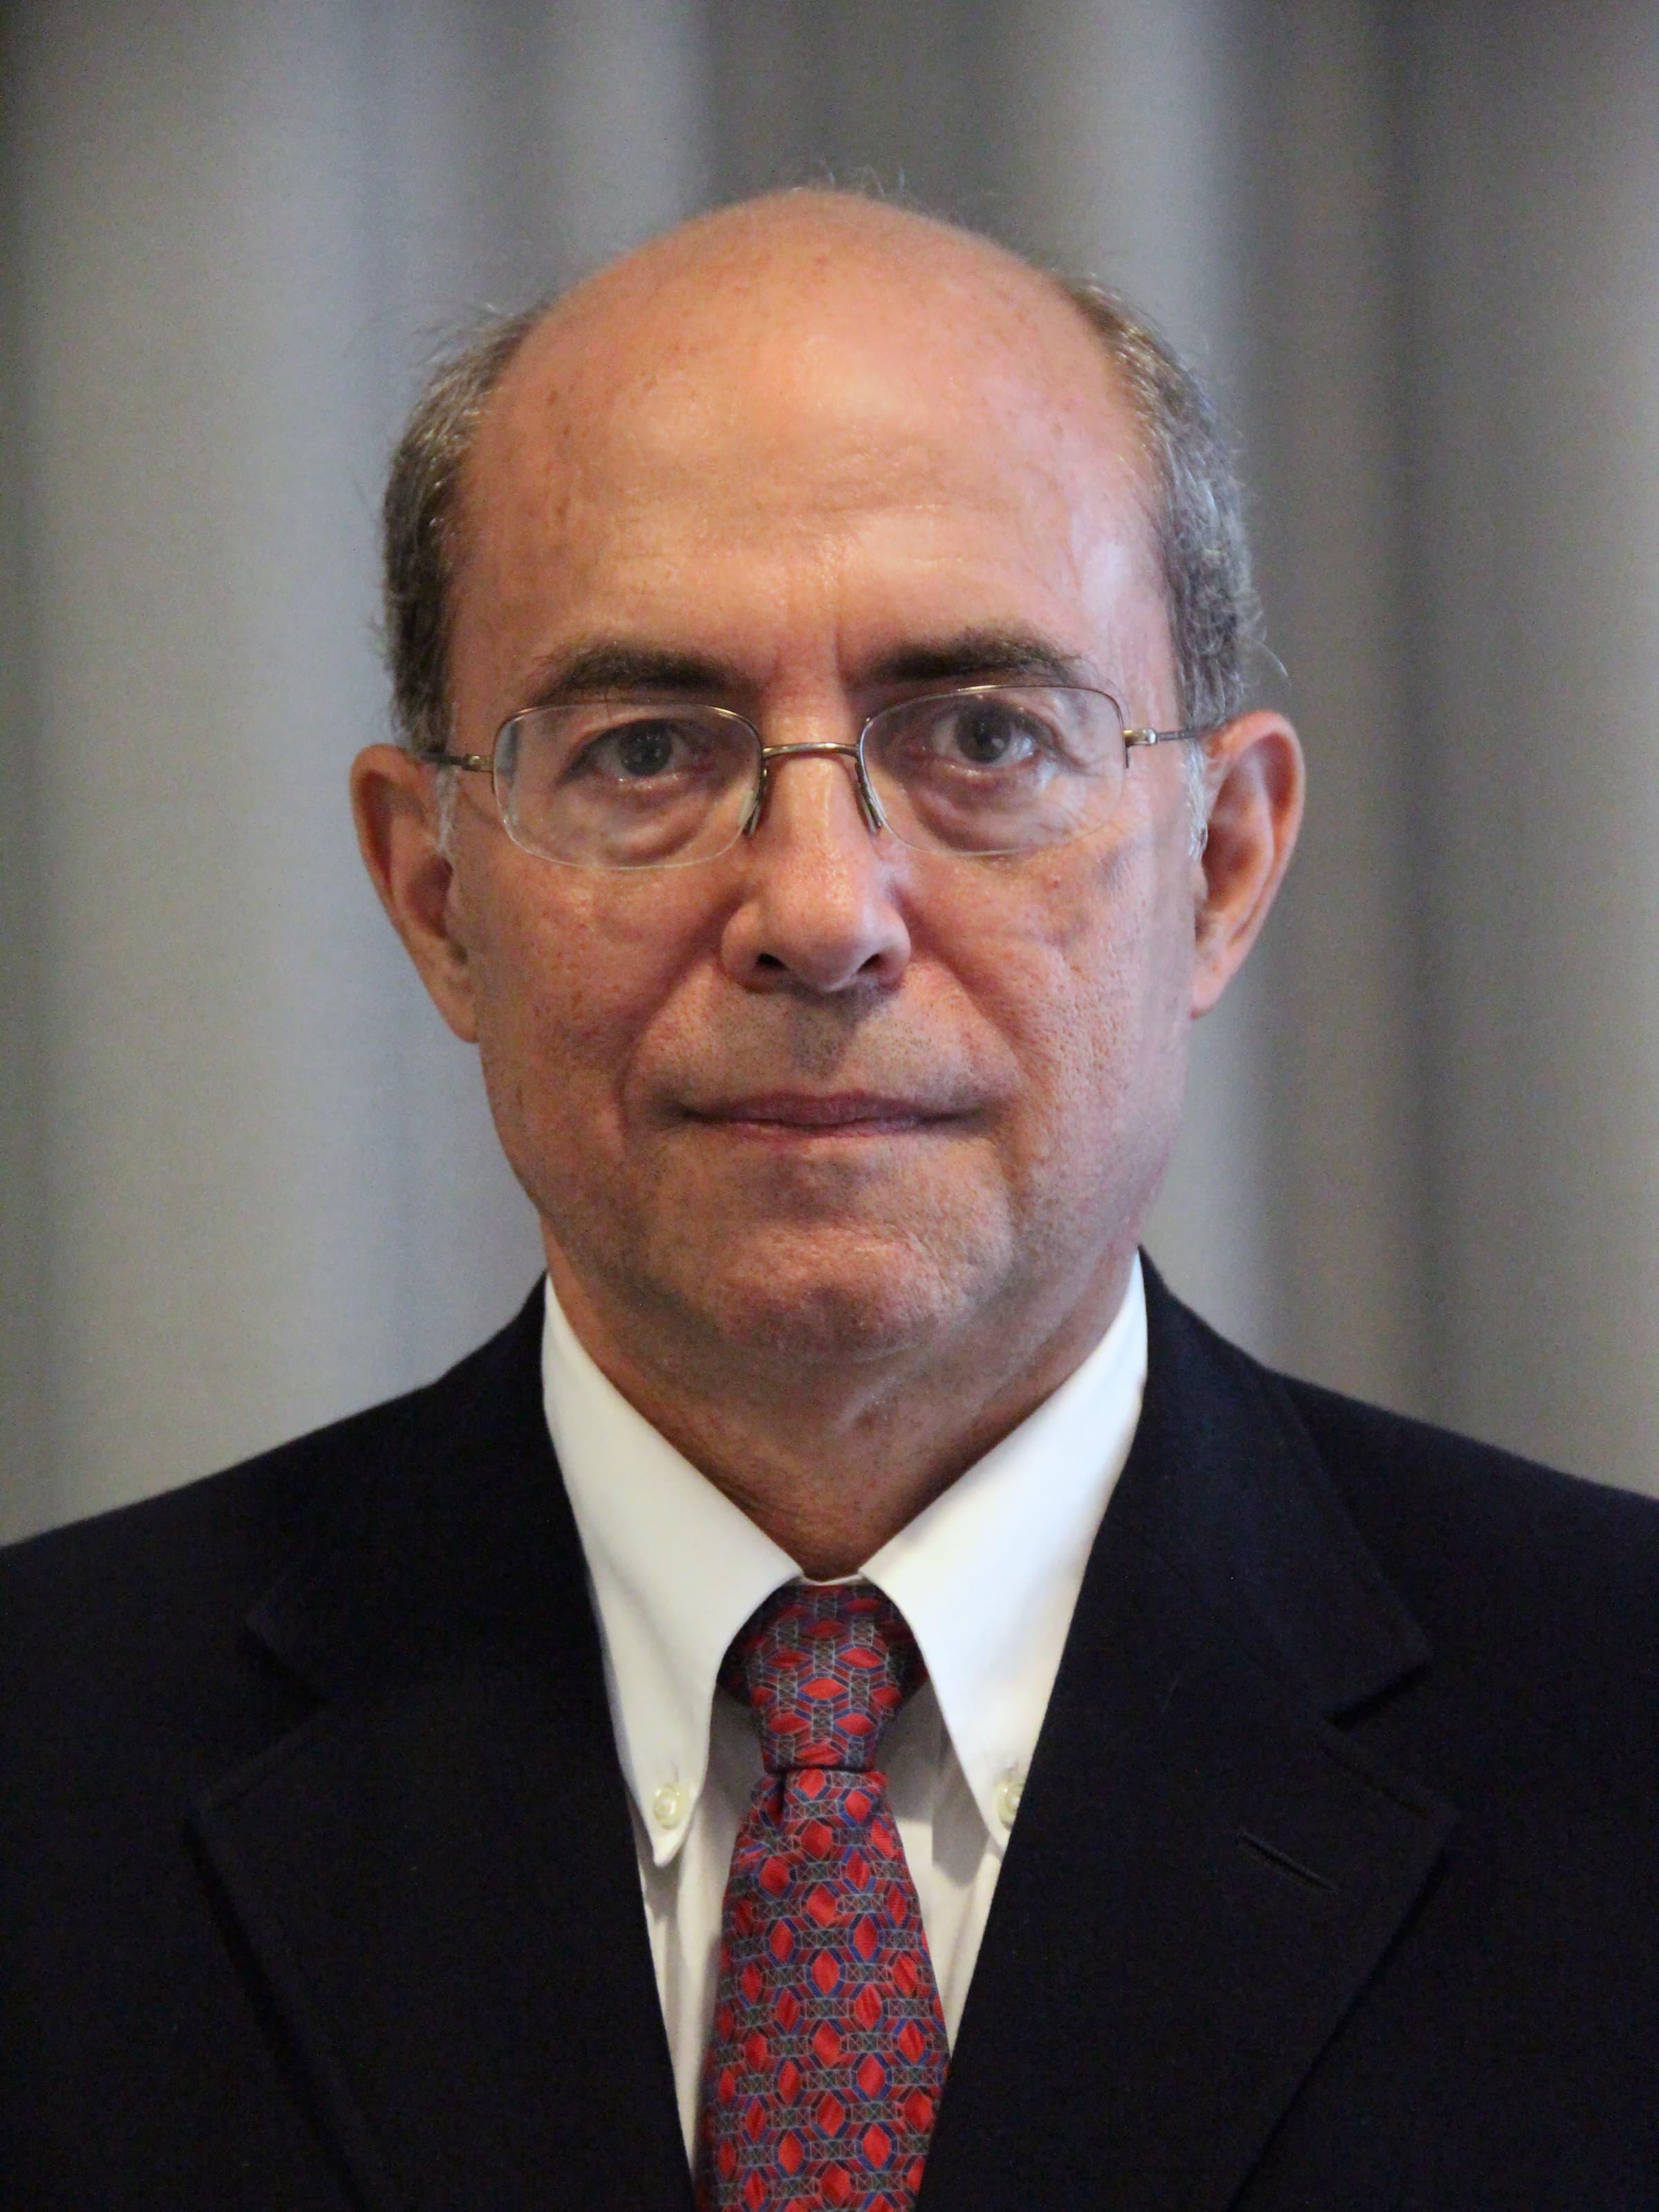 James Leckman